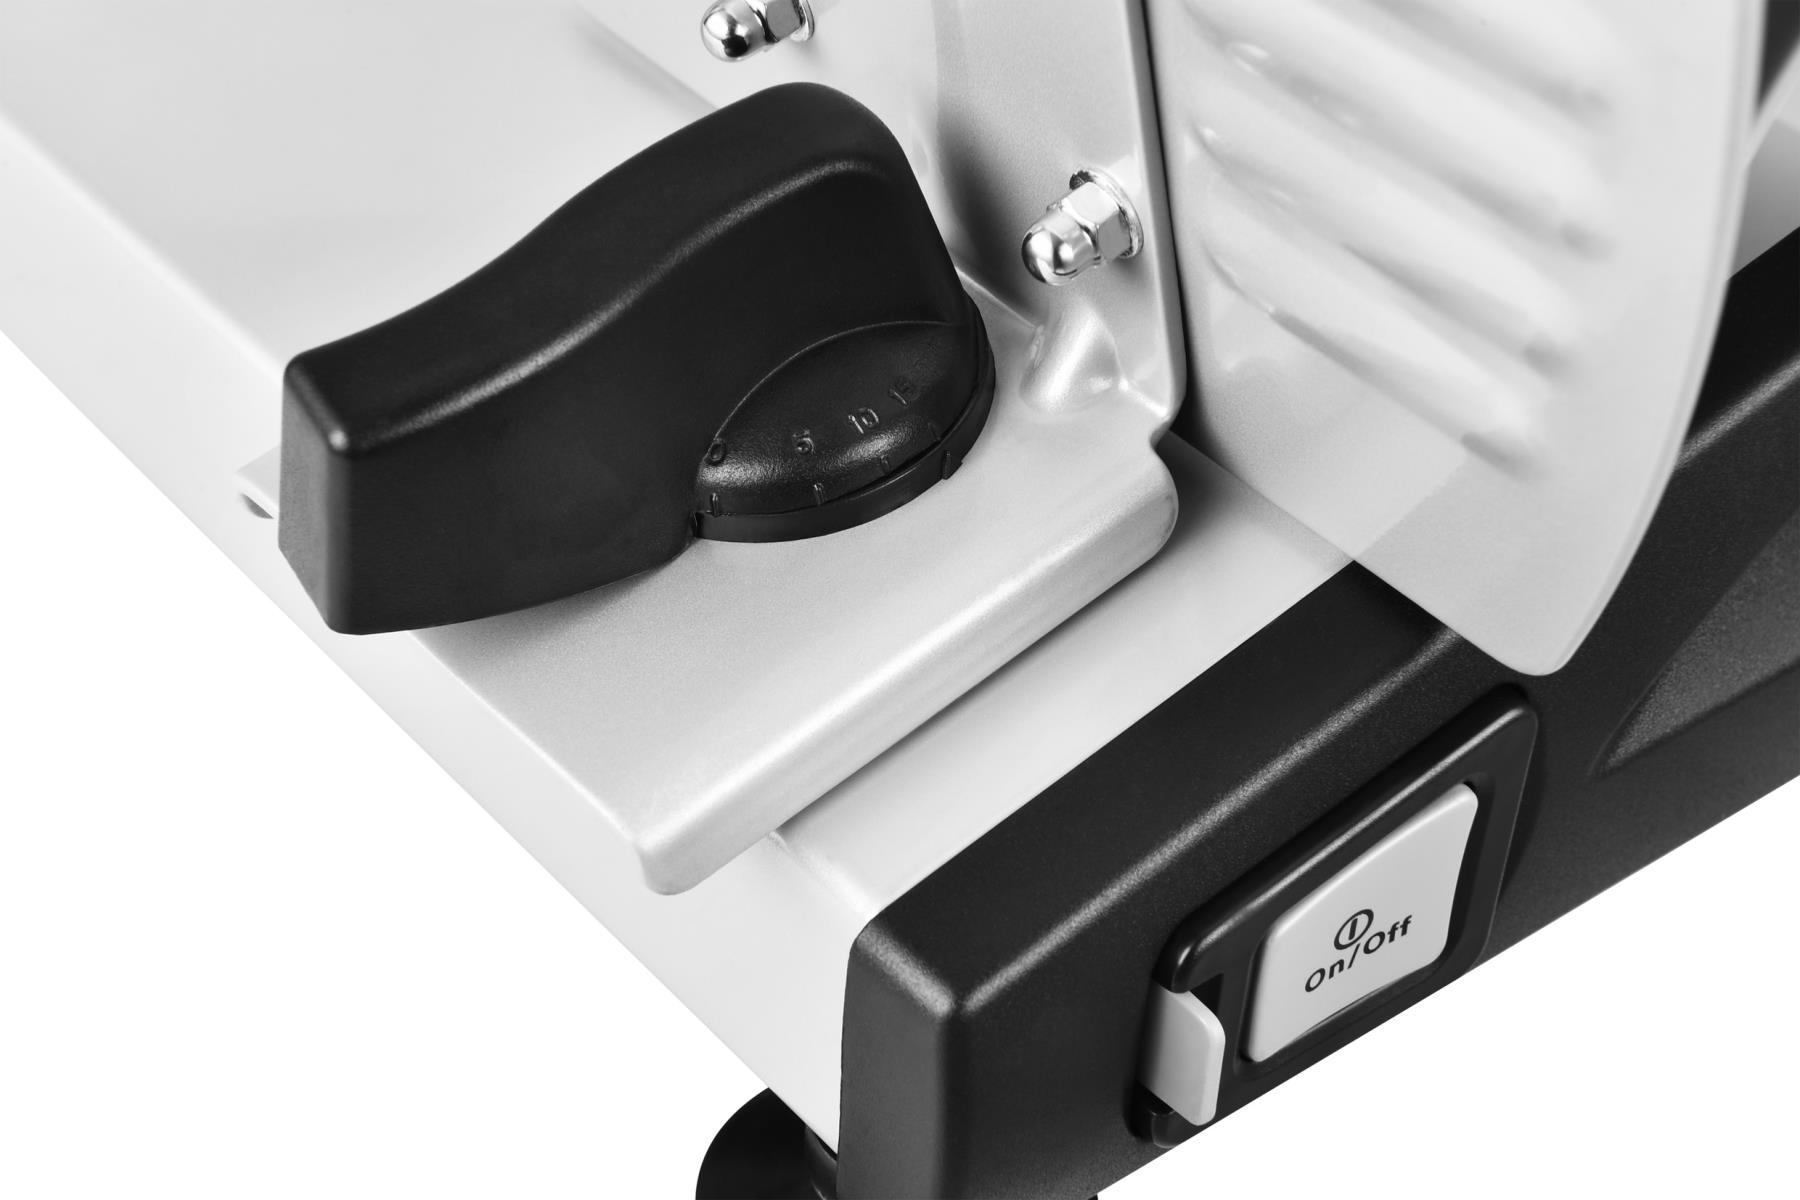 Metall Allesschneider Brotschneidemaschine Edelstahlmesser 19cm Silber*57918 004